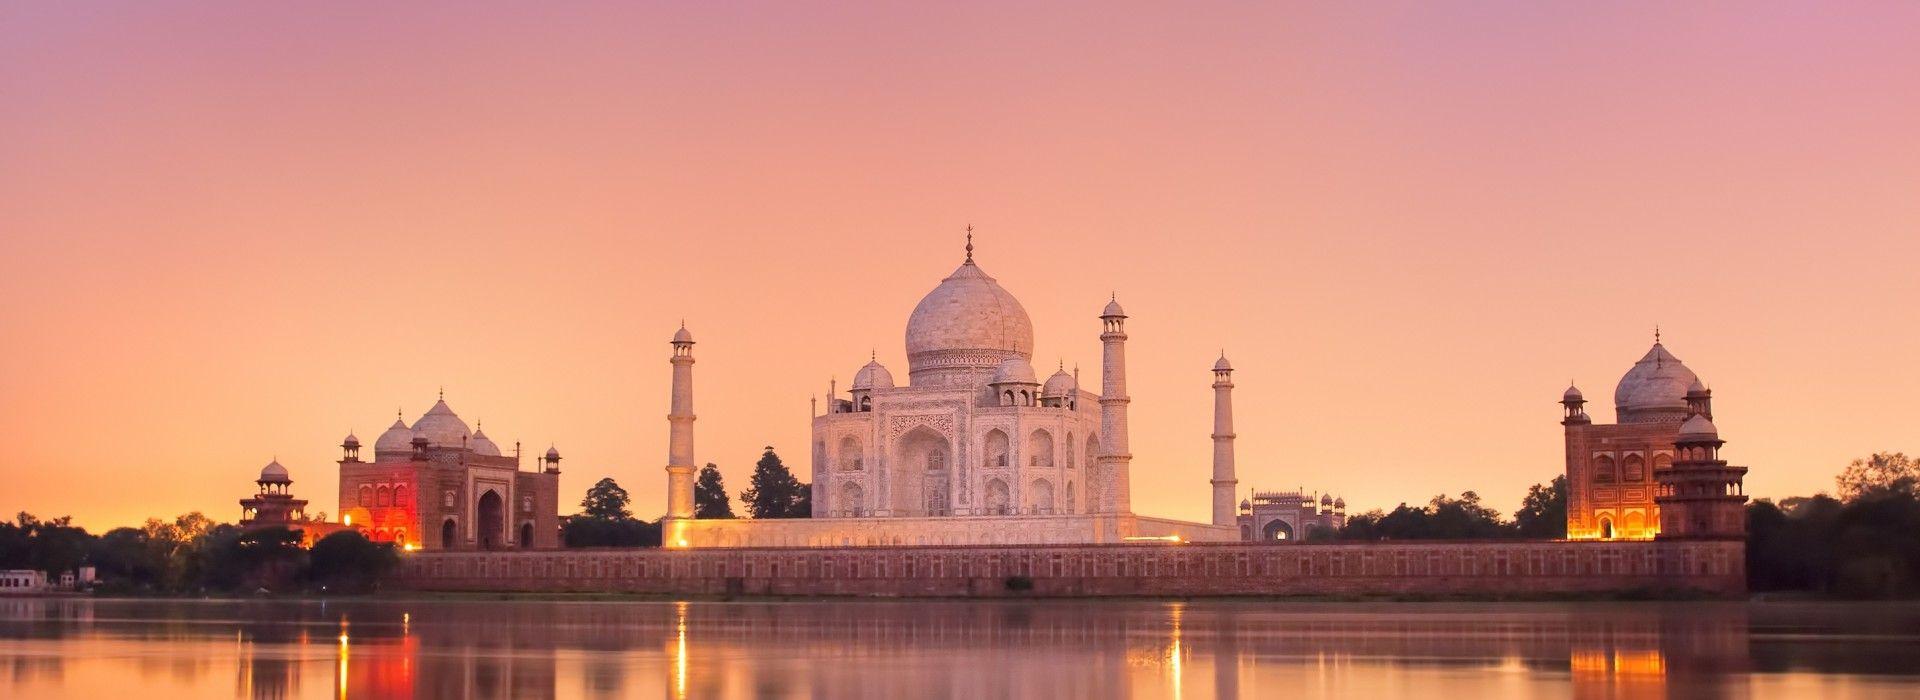 Uttarakhand & Varanasi Tours